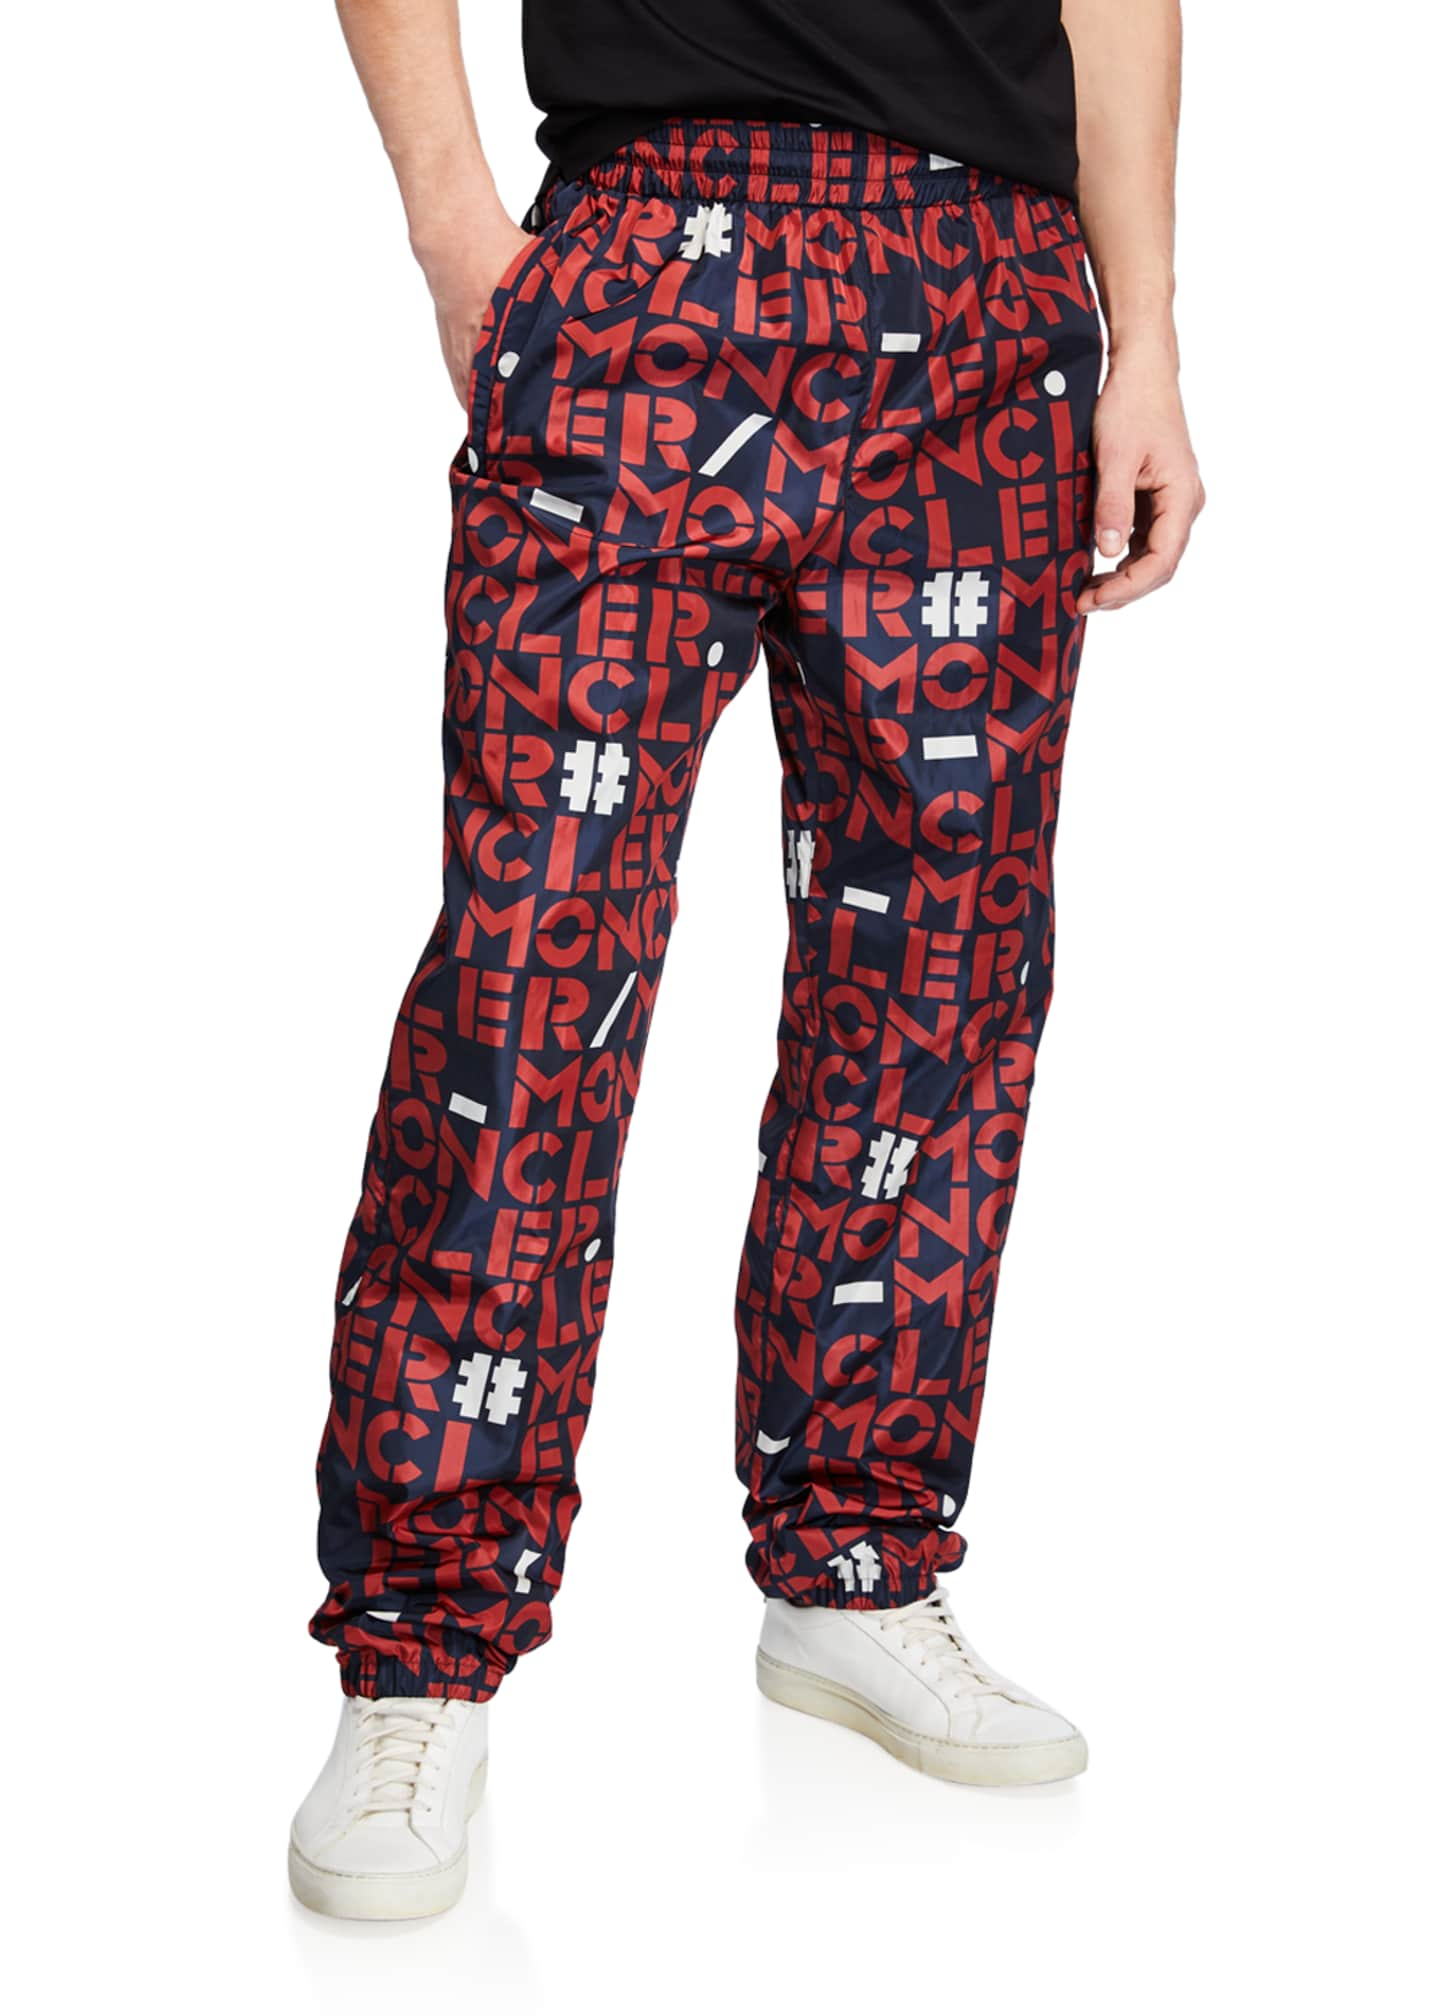 Moncler Genius Men's Block Logo Nylon Athletic Pants